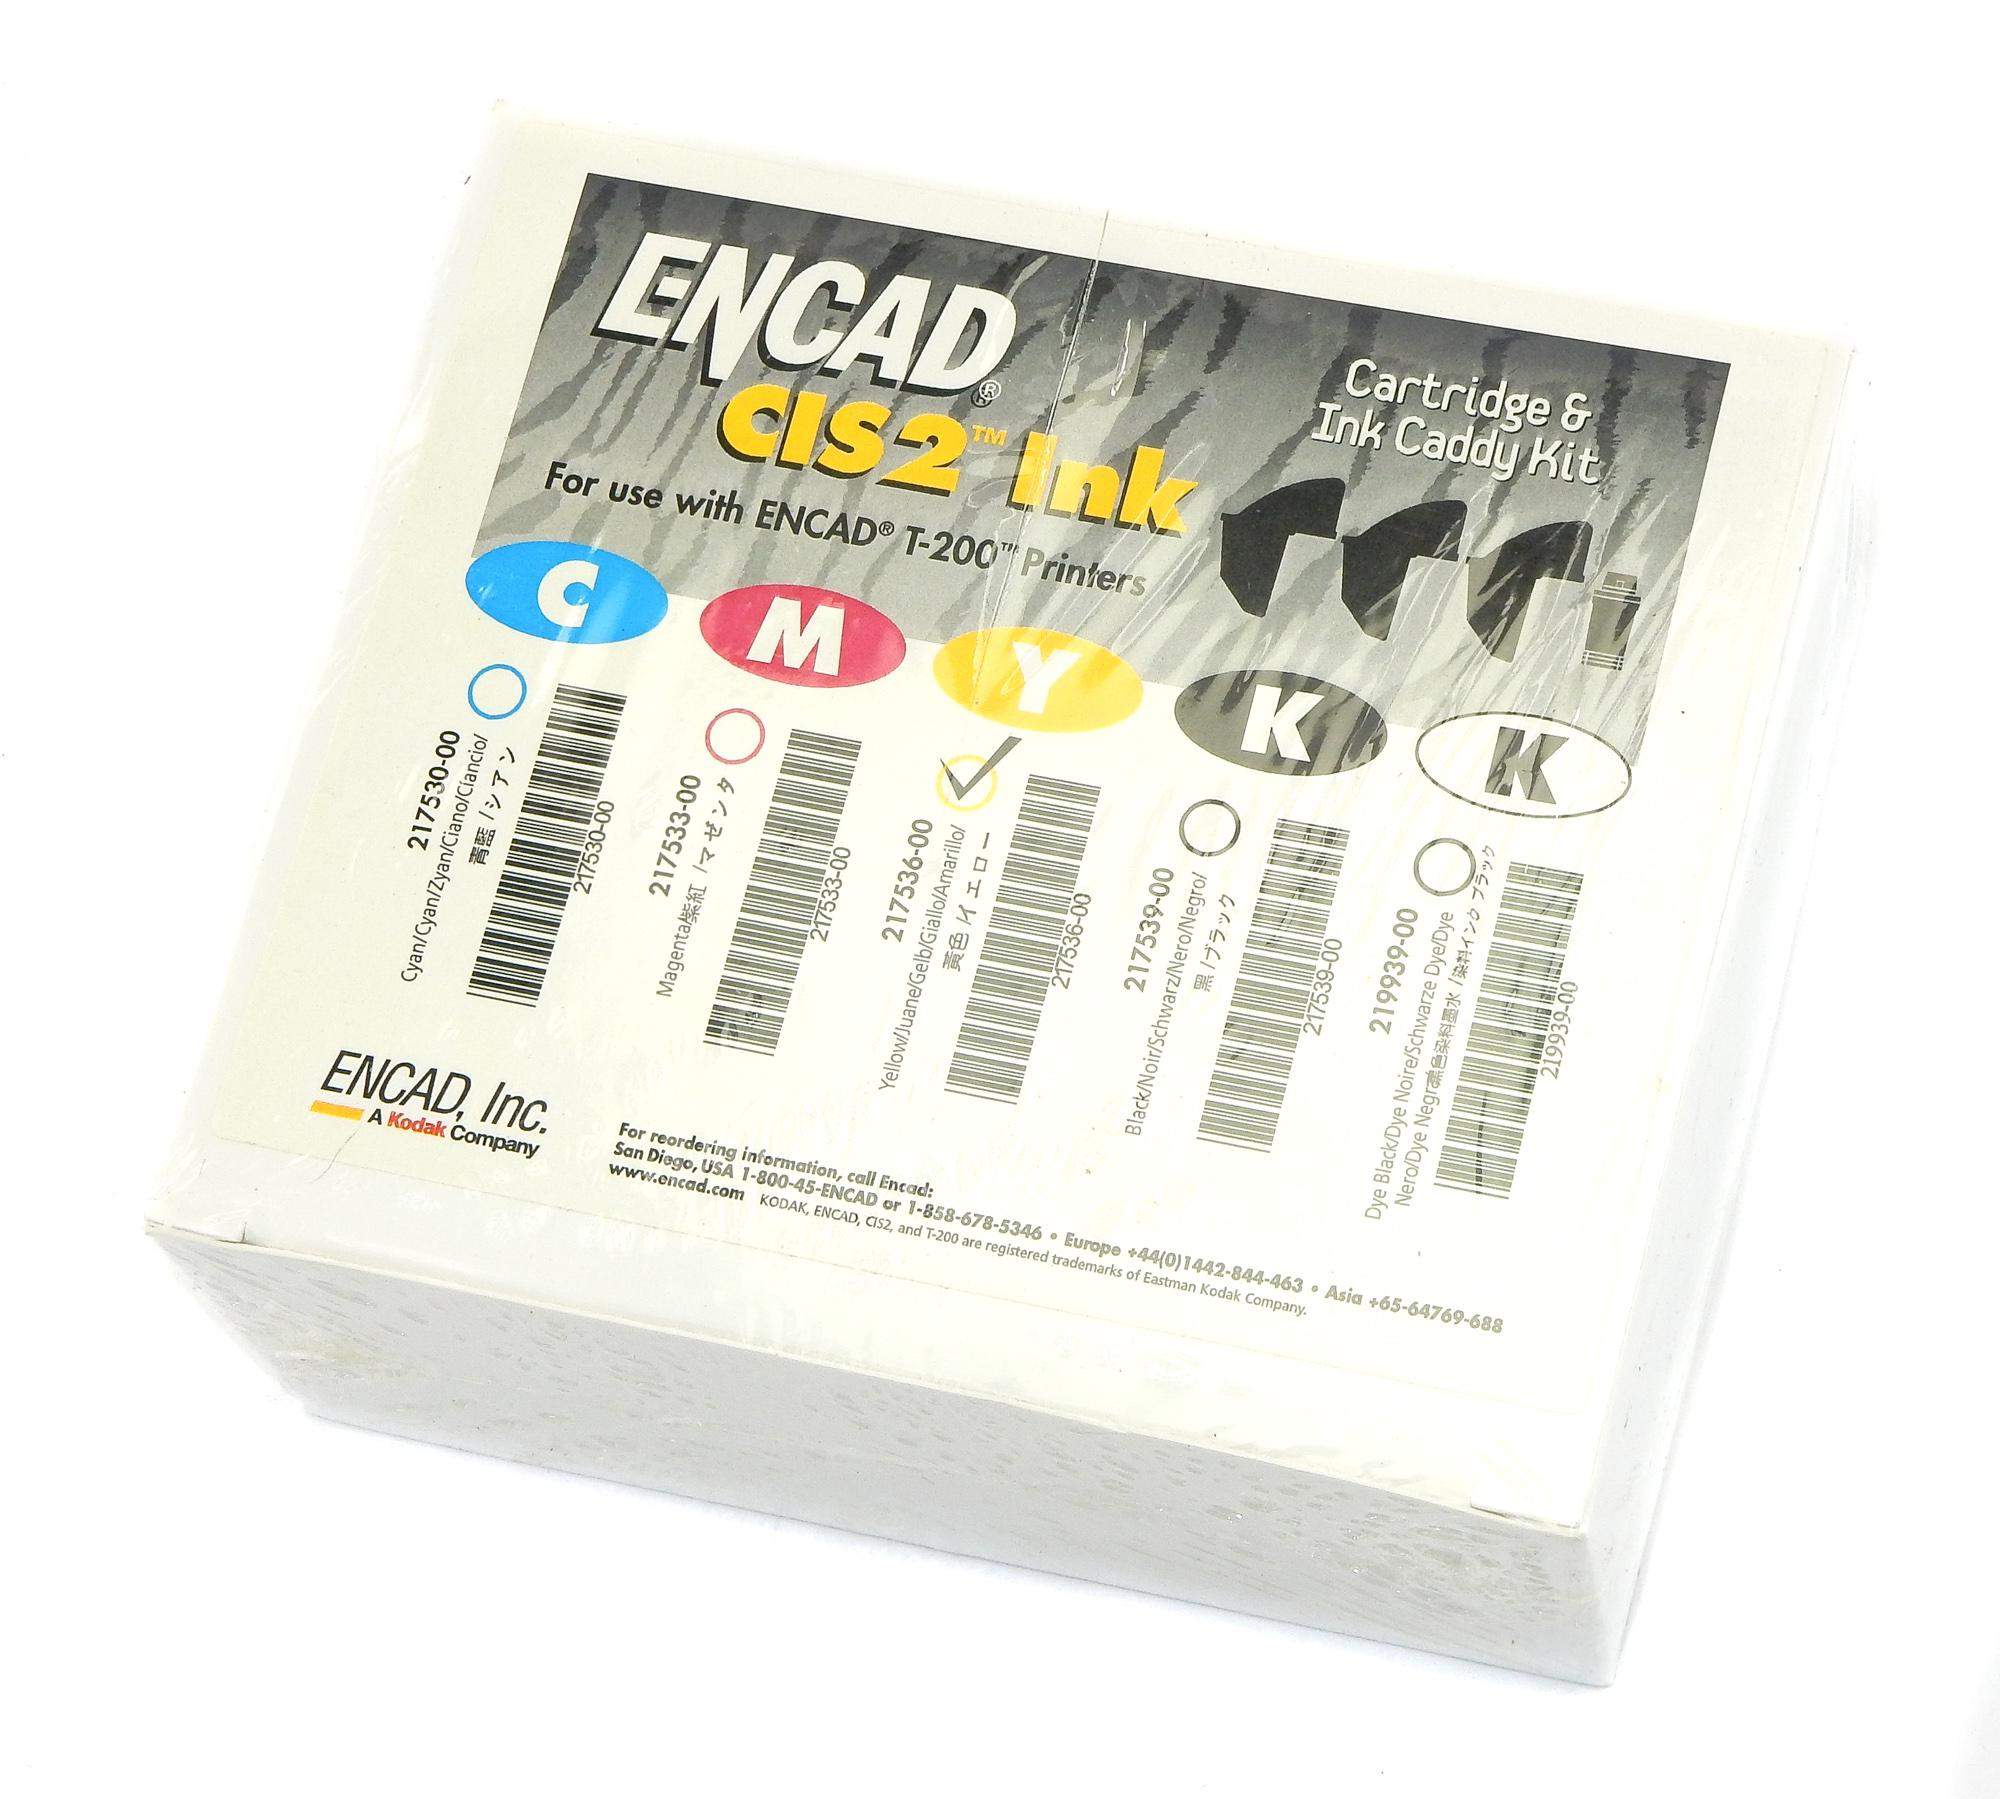 Genuine & New ENCAD 217536-00 CIS2 Cartridge & Ink Caddy Kit - Yellow